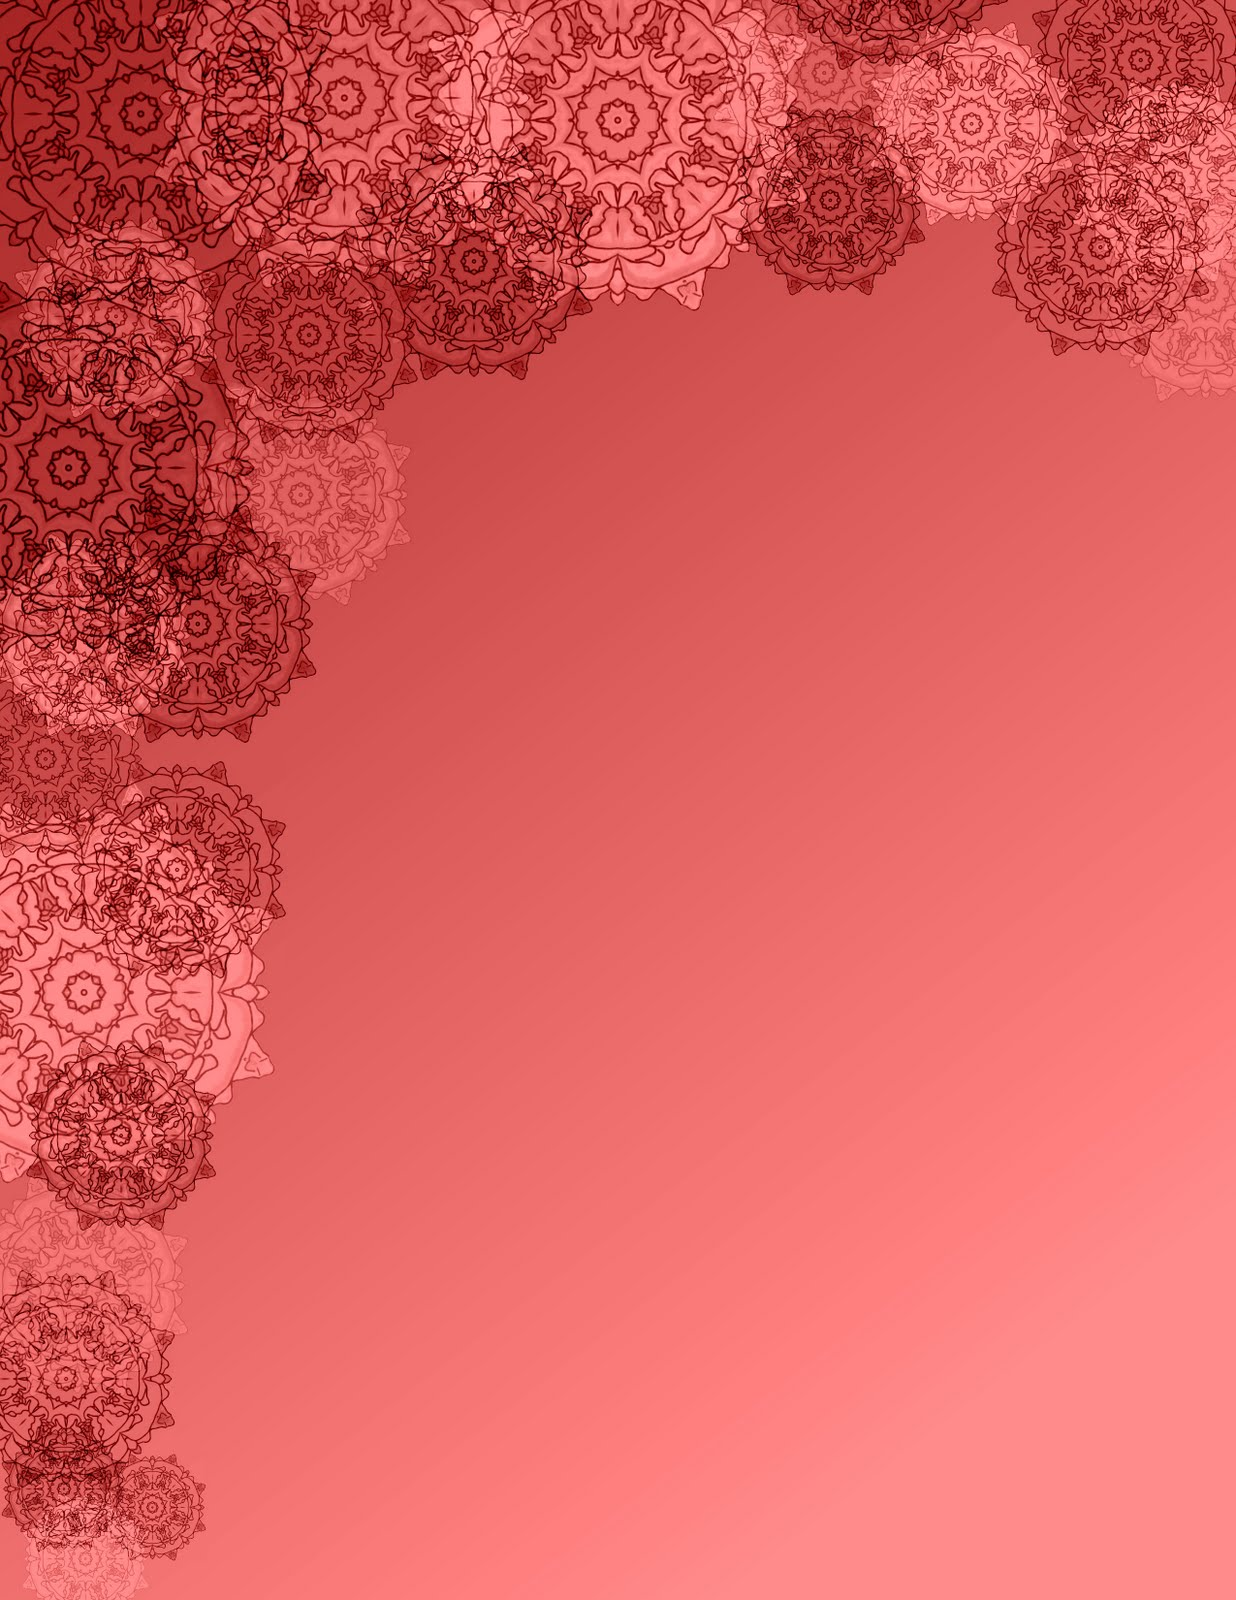 coral colored wallpaper  pic new posts: Wallpaper Coral Color